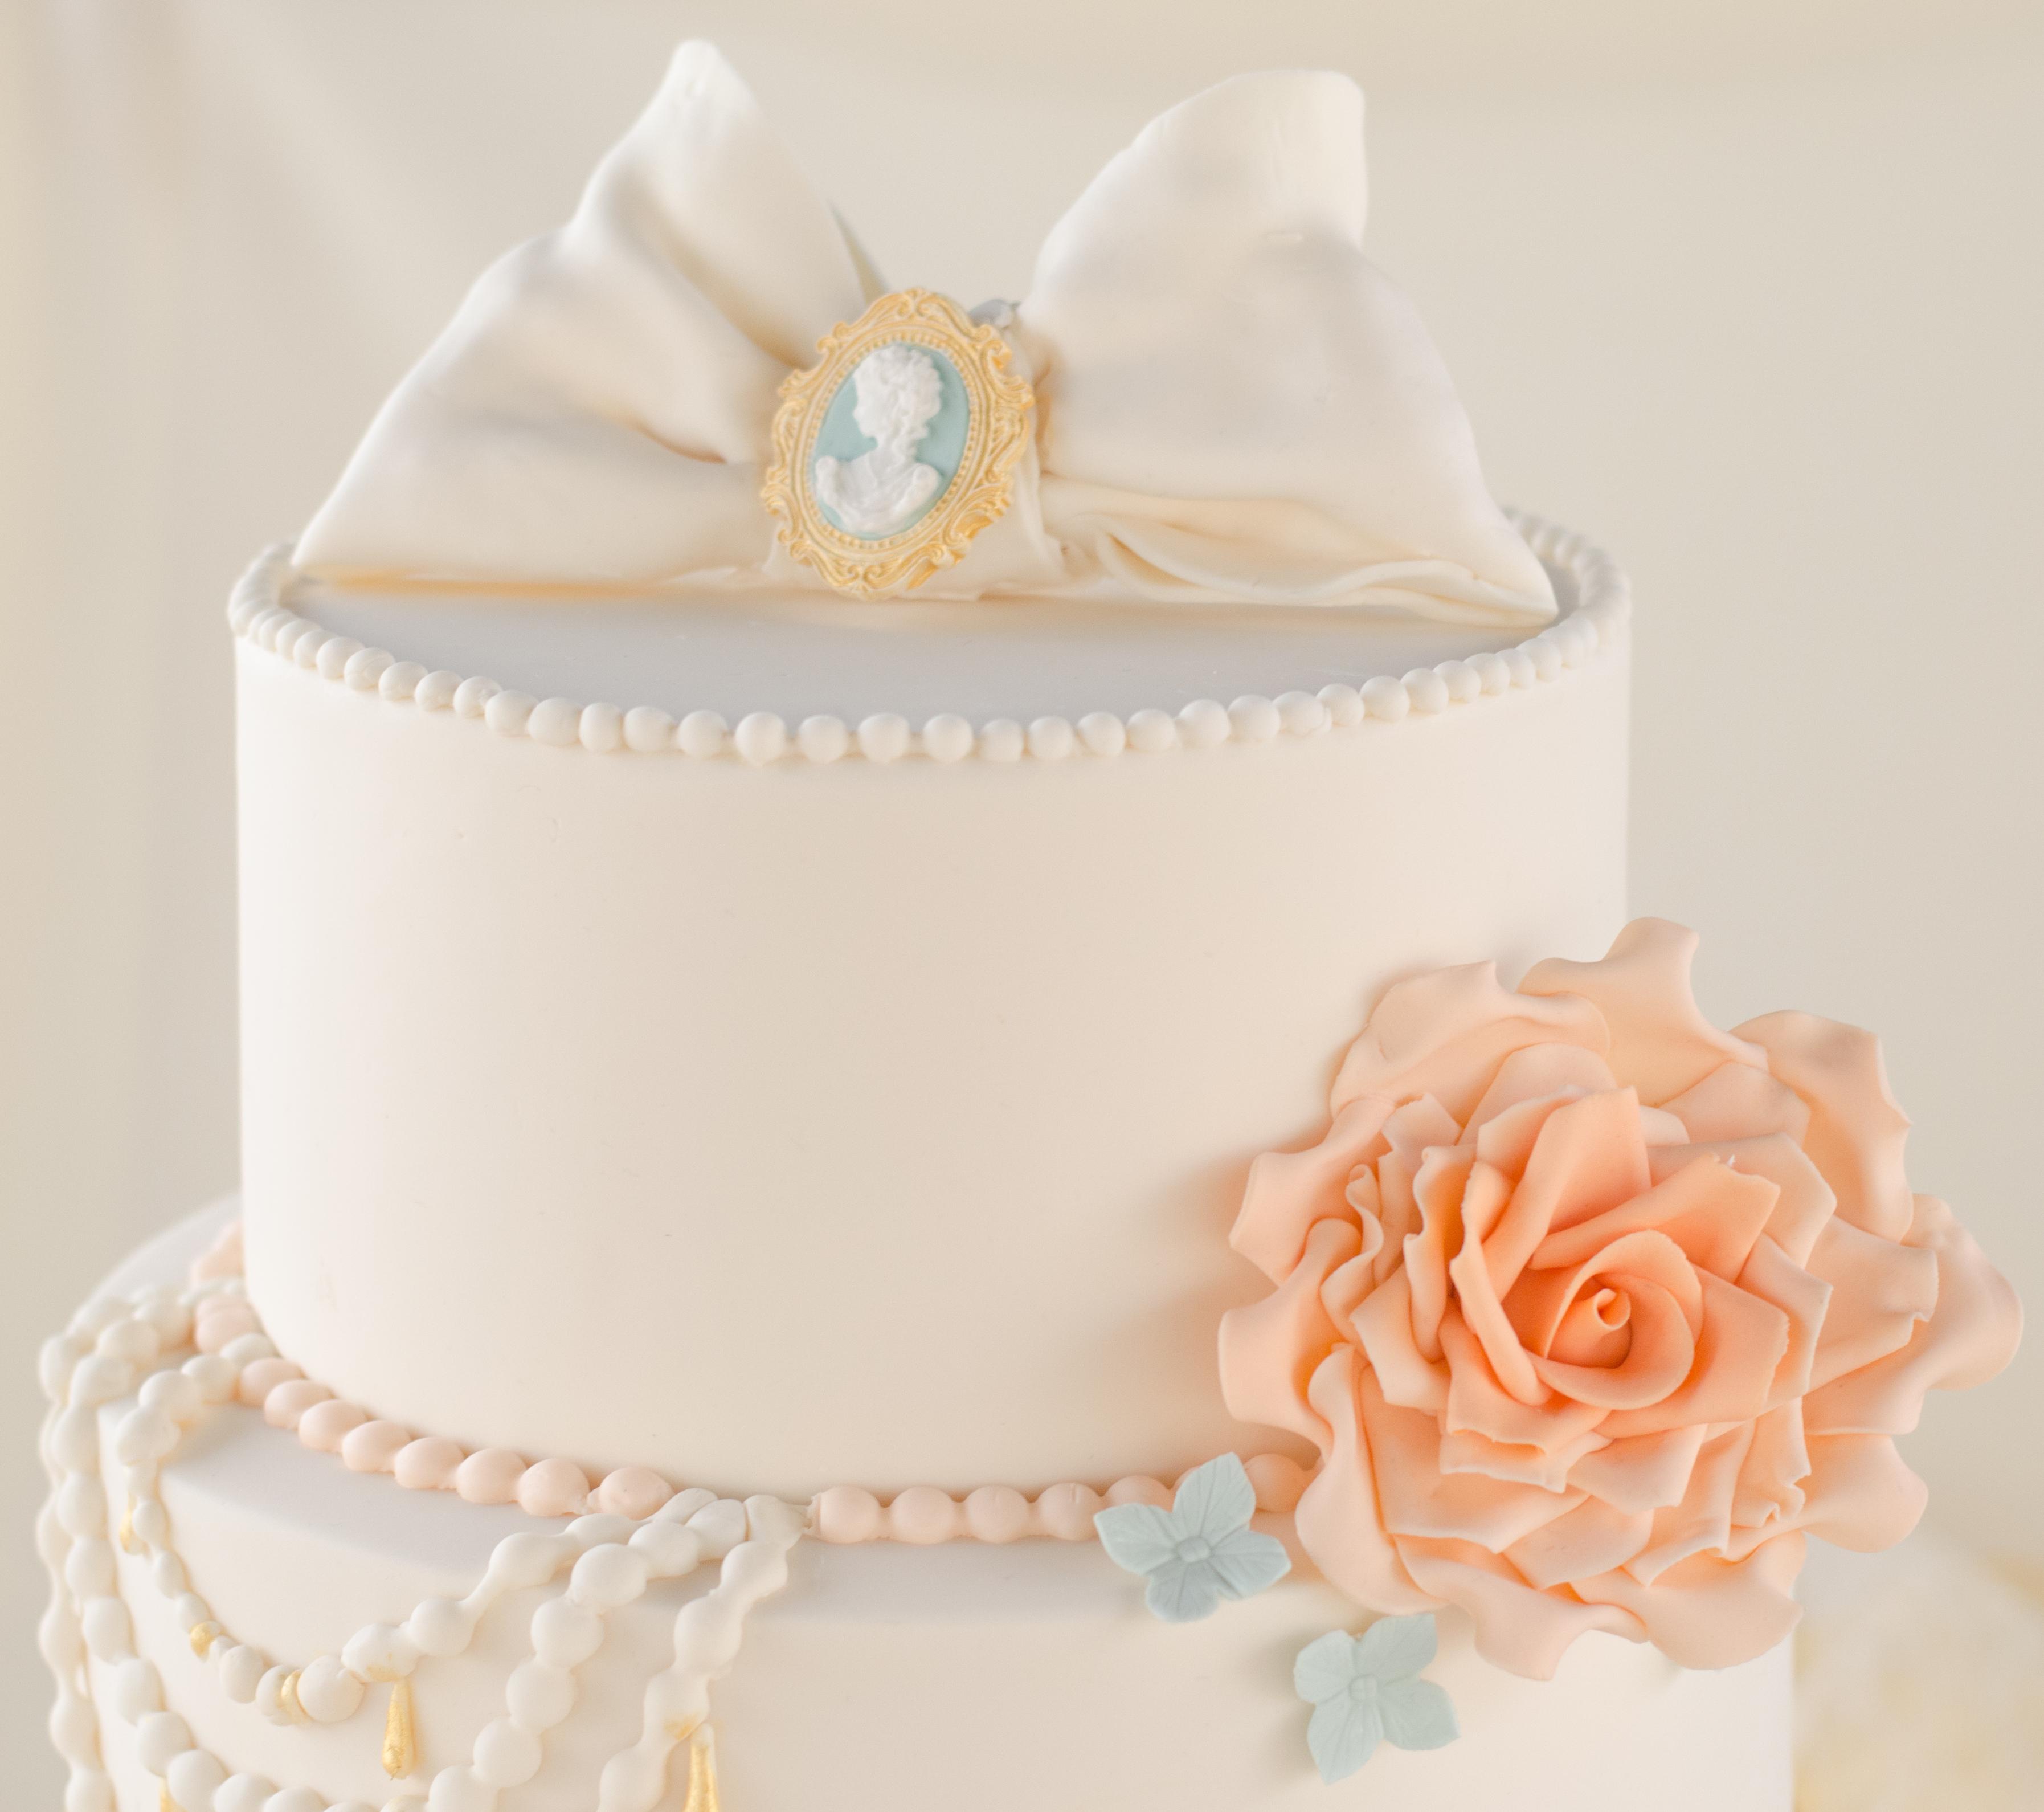 Eggless Wedding Cakes